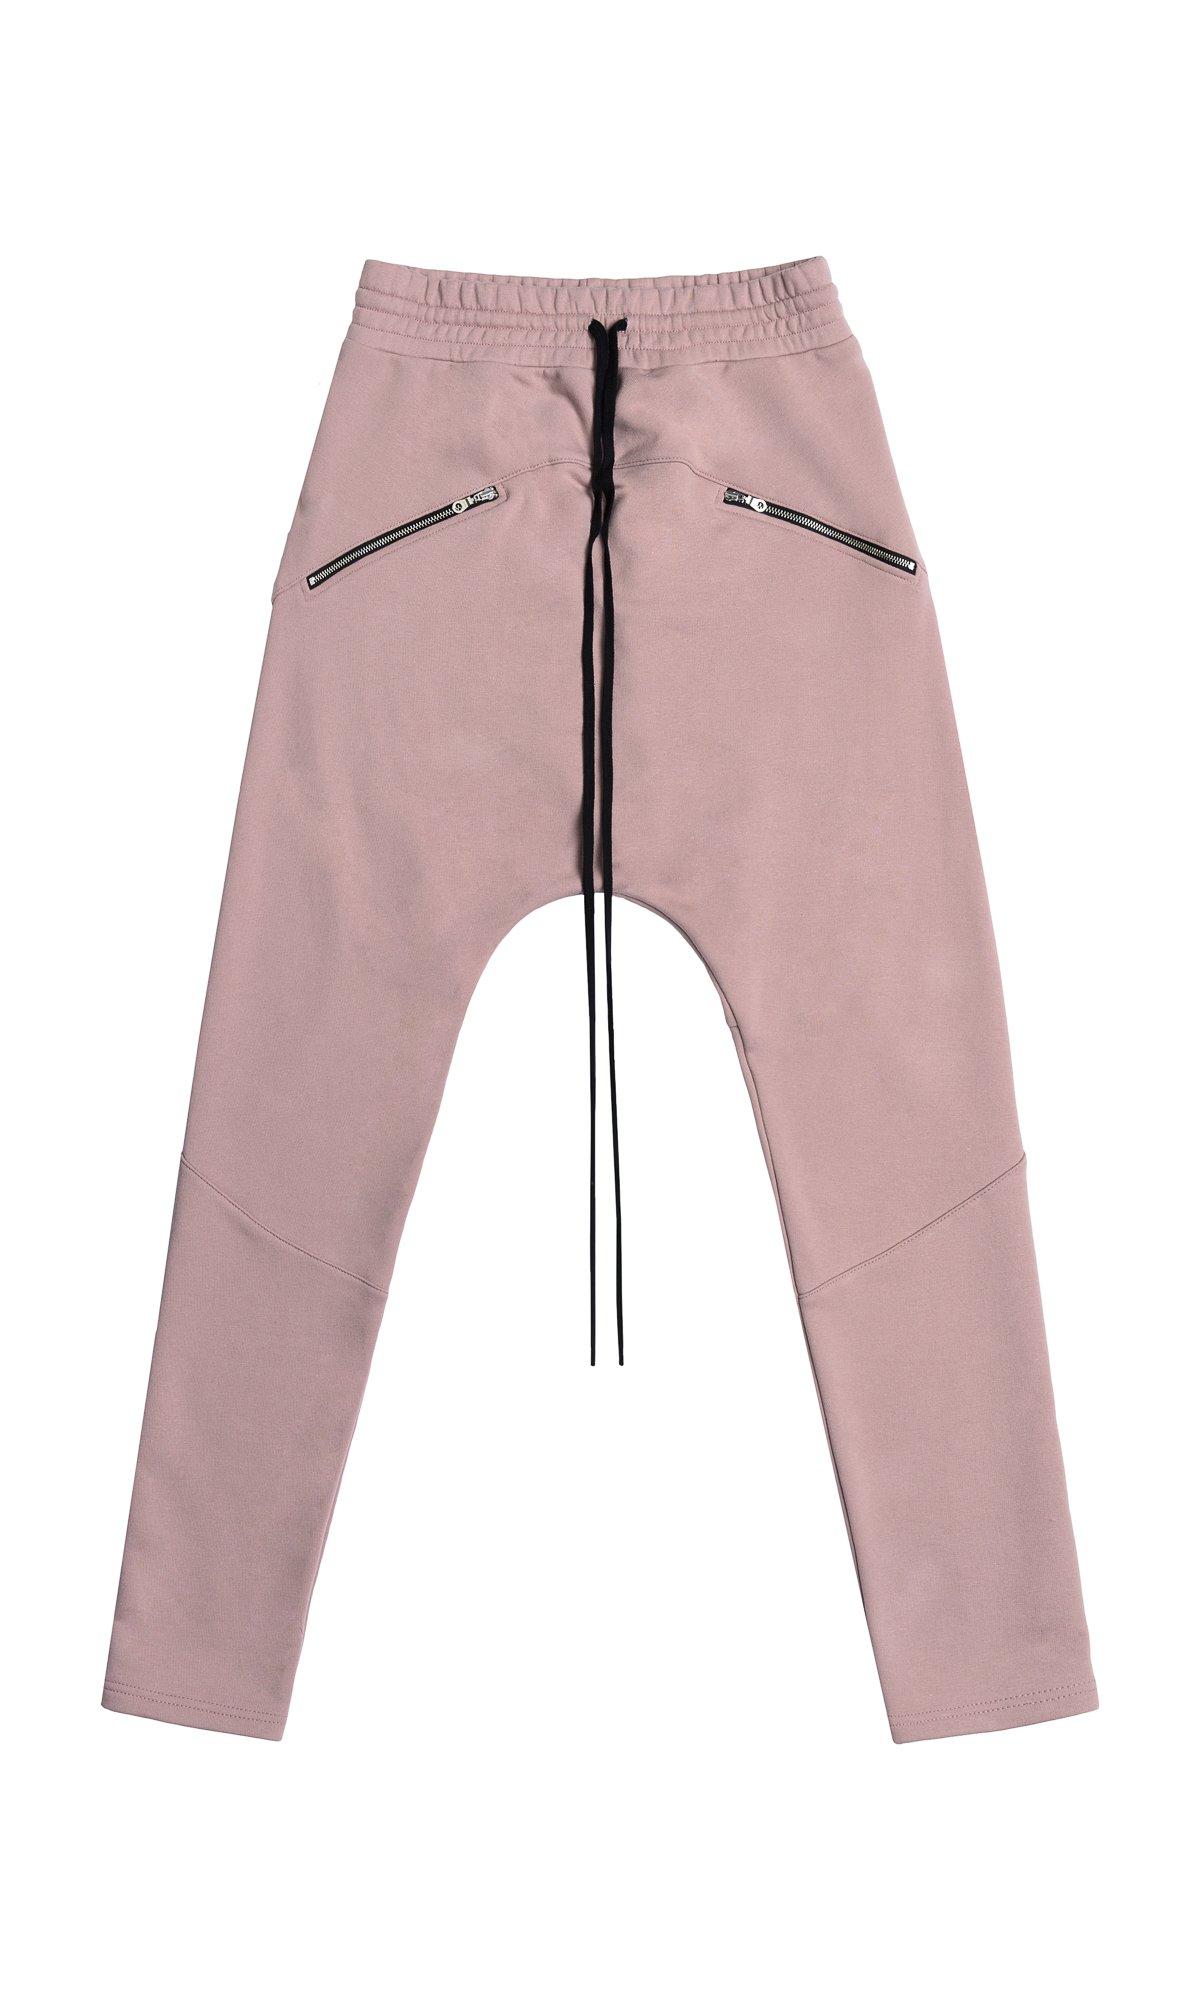 Drop Crotch Pants With Zipper Pockets